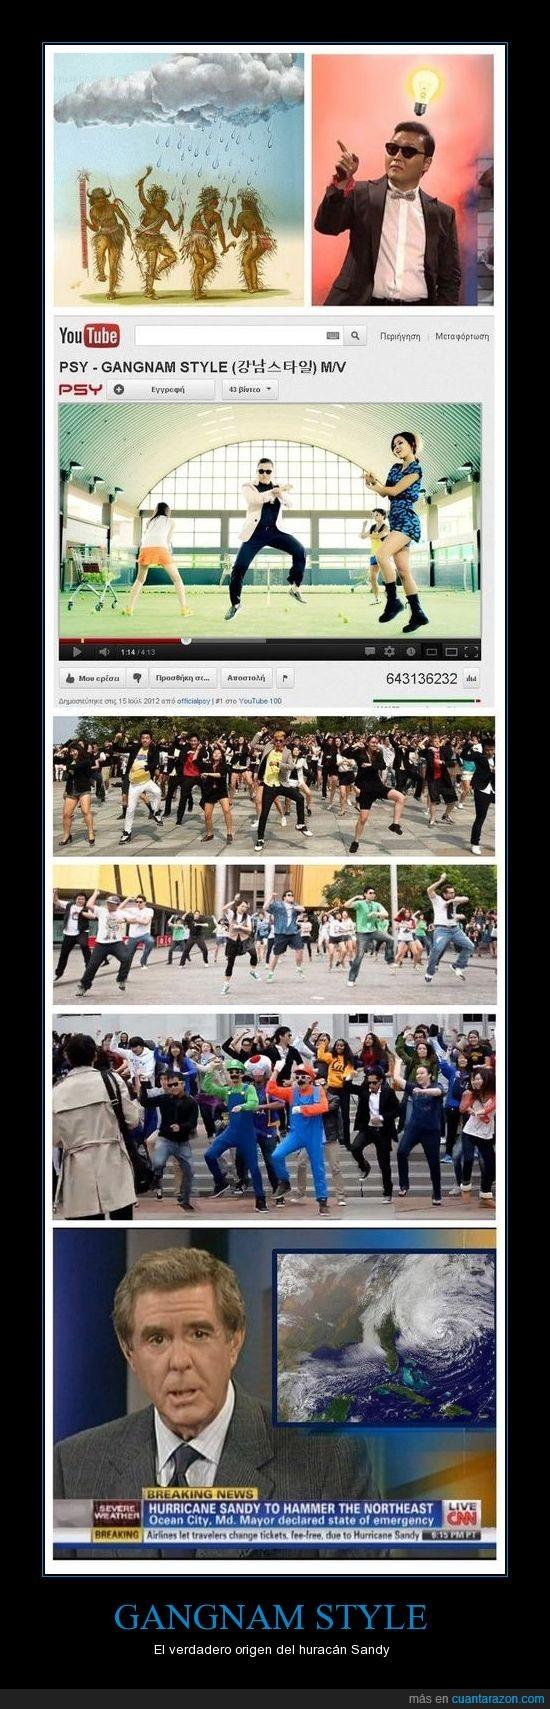 baile,gangnam style,huracan,lluvia,psy,sandy